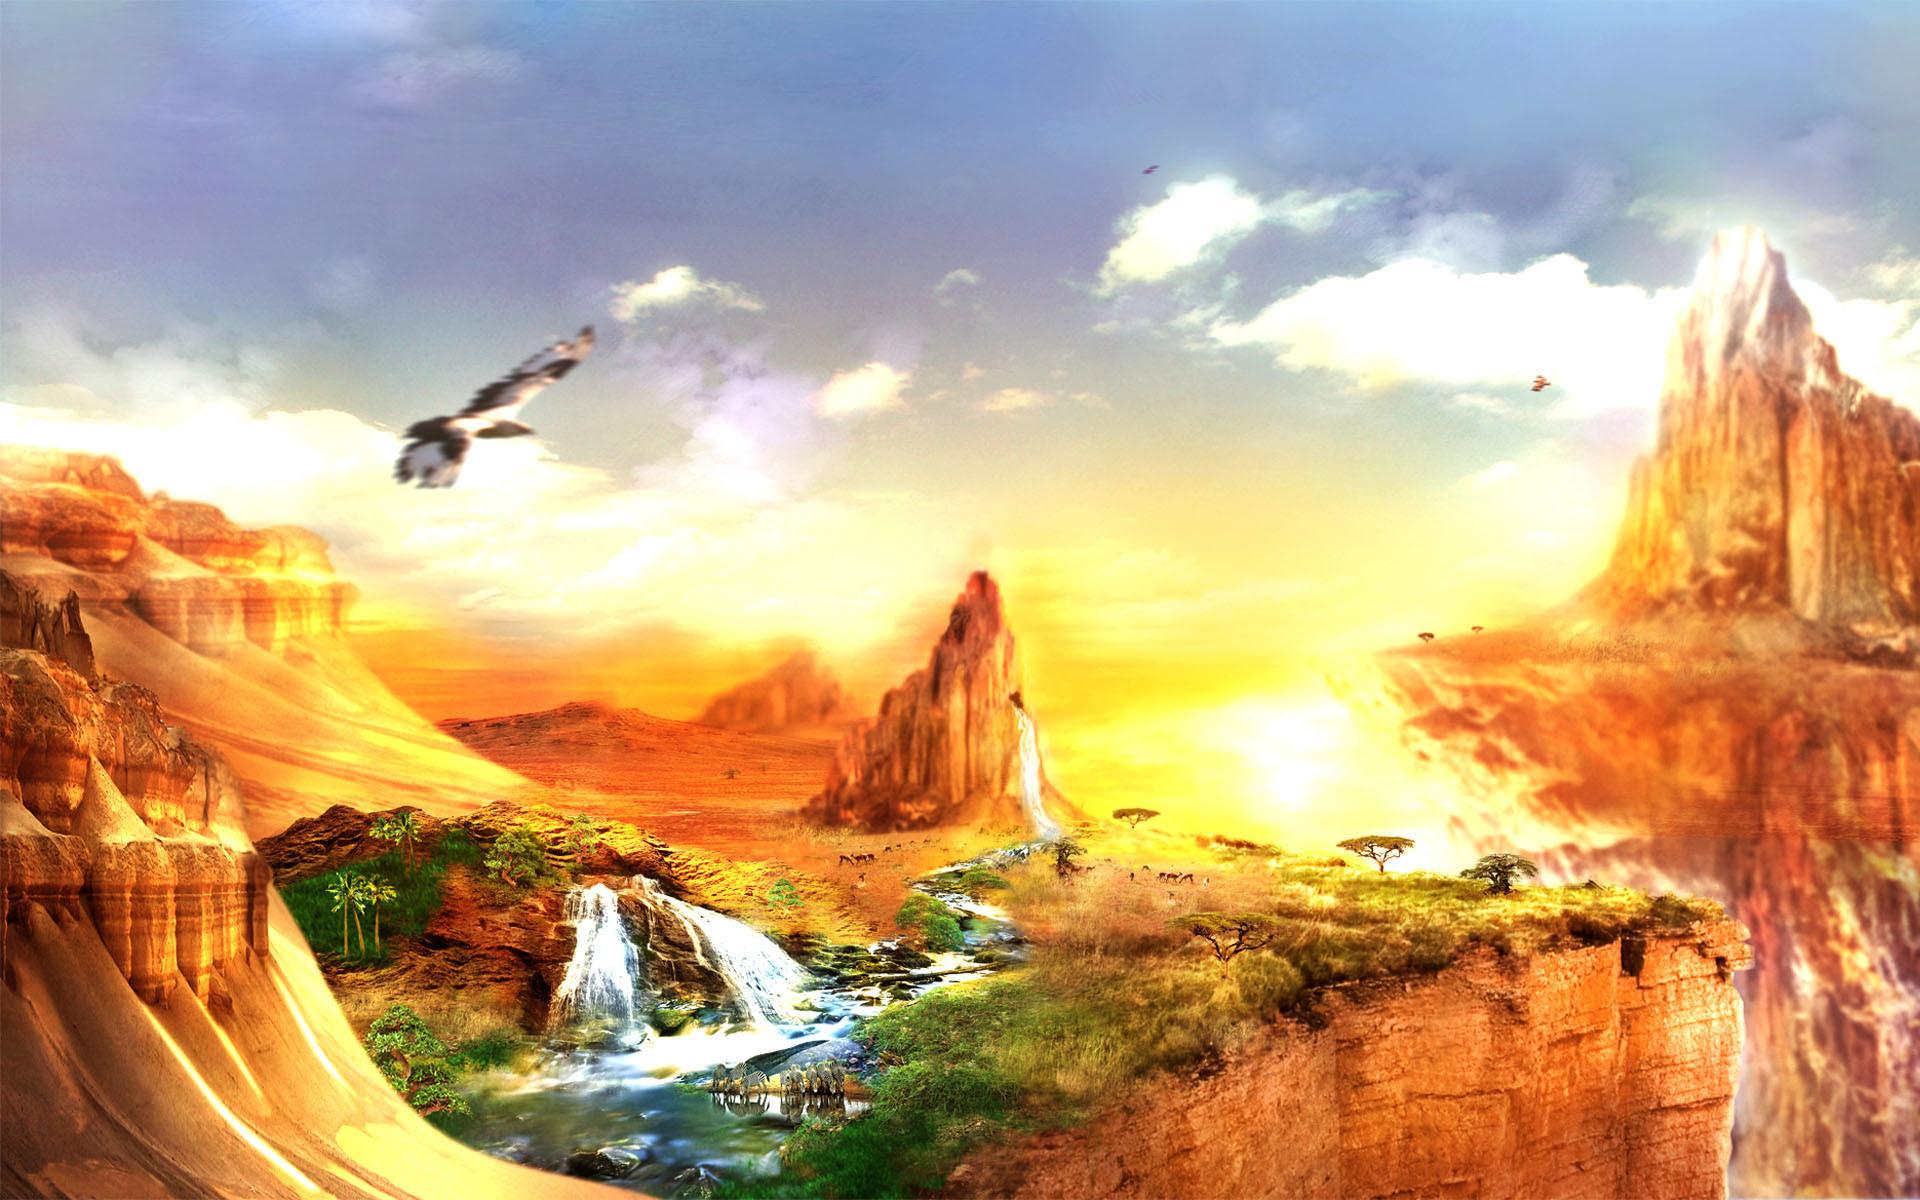 Amazing Scenery Wallpaper (72+ images)